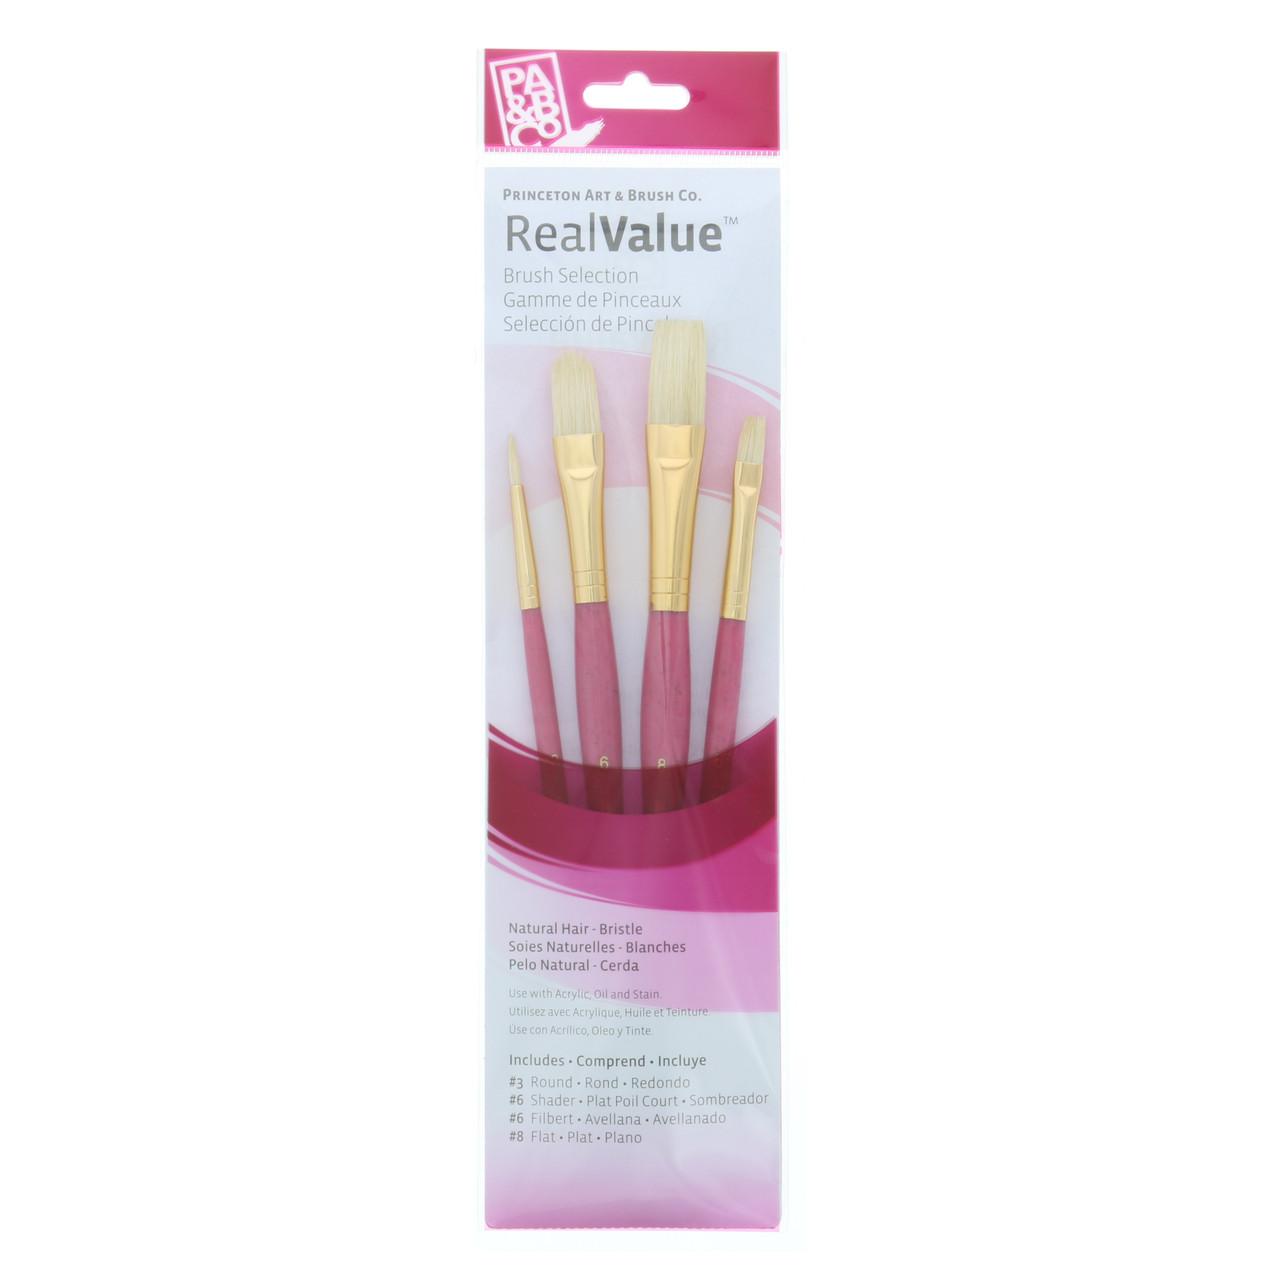 Natural-Bristle 4-Brush Set Round 3, Shader 6, Filbert 6, Flat 8